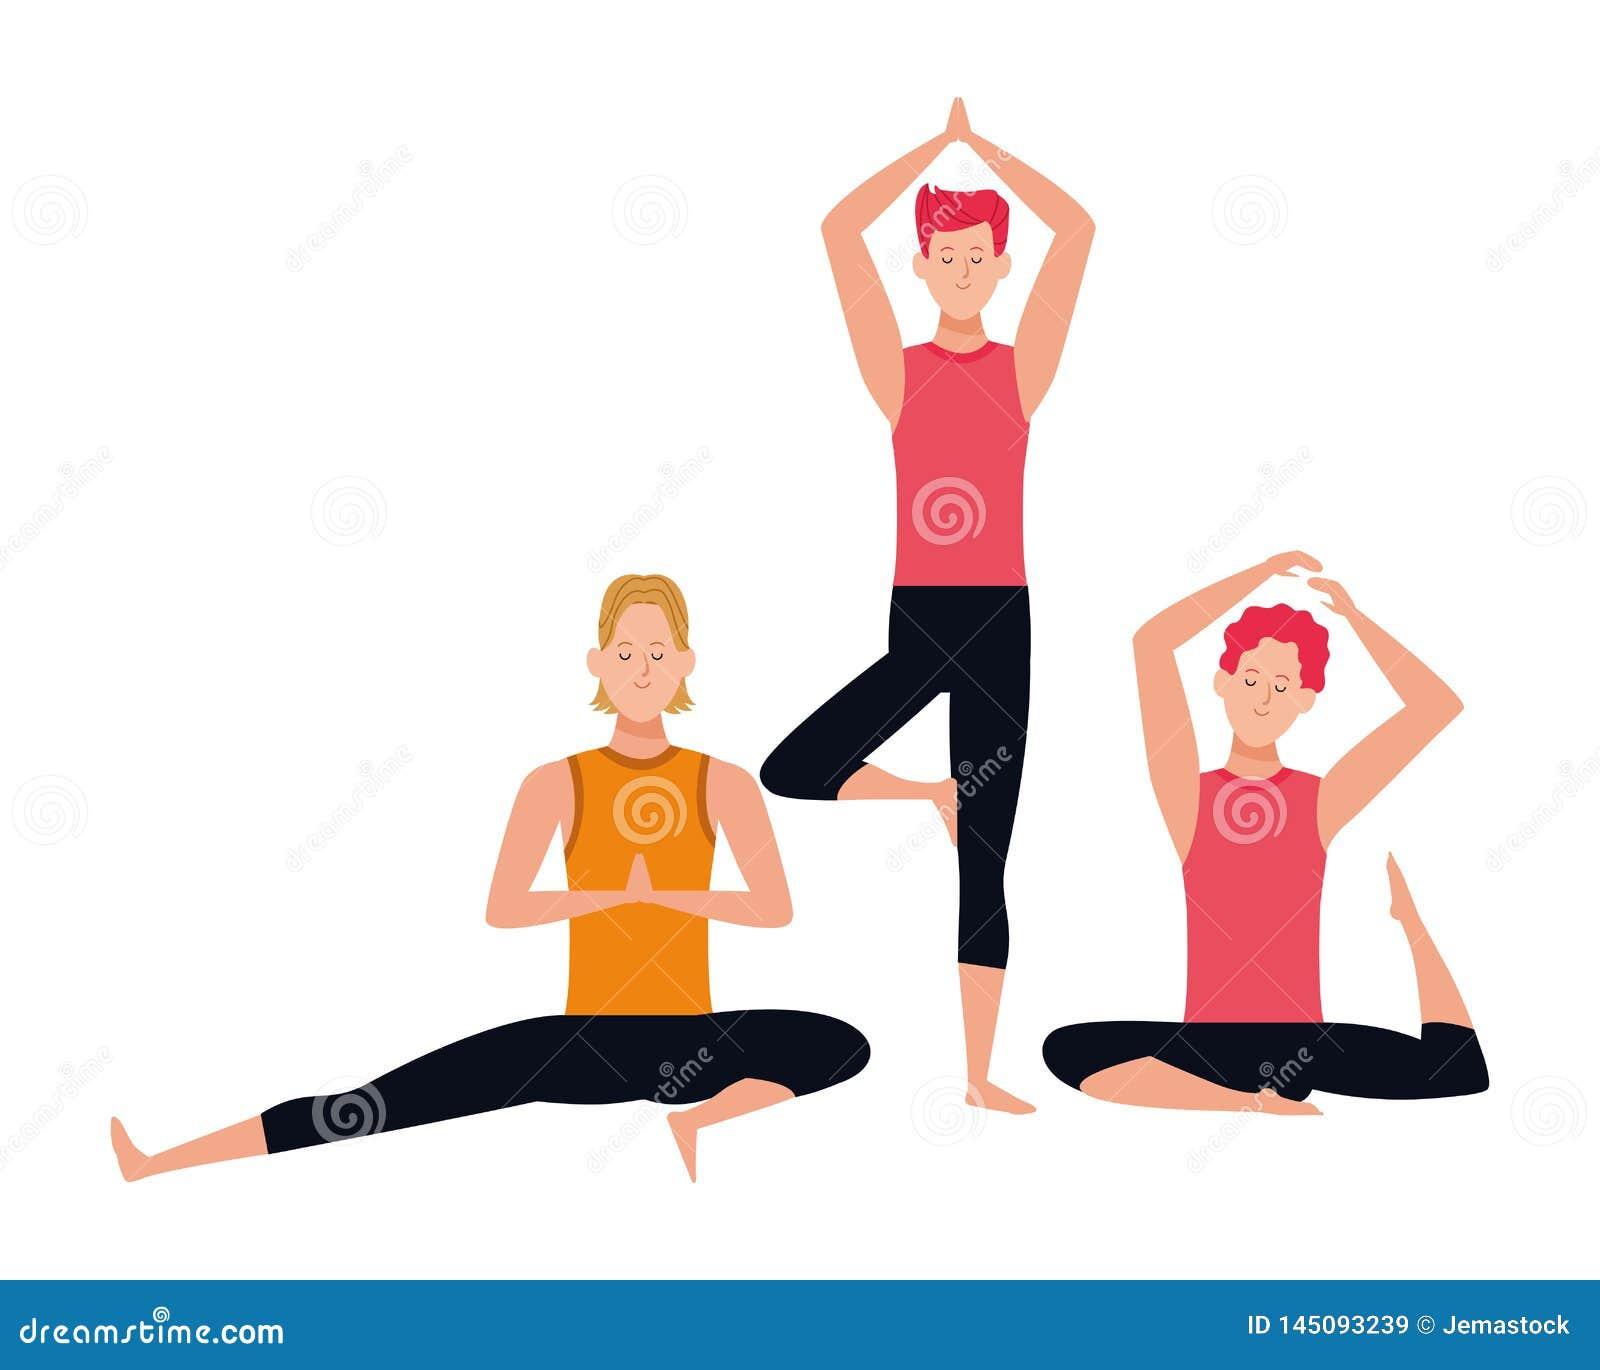 Yoga Poses Cartoon Stock Illustrations 3 223 Yoga Poses Cartoon Stock Illustrations Vectors Clipart Dreamstime